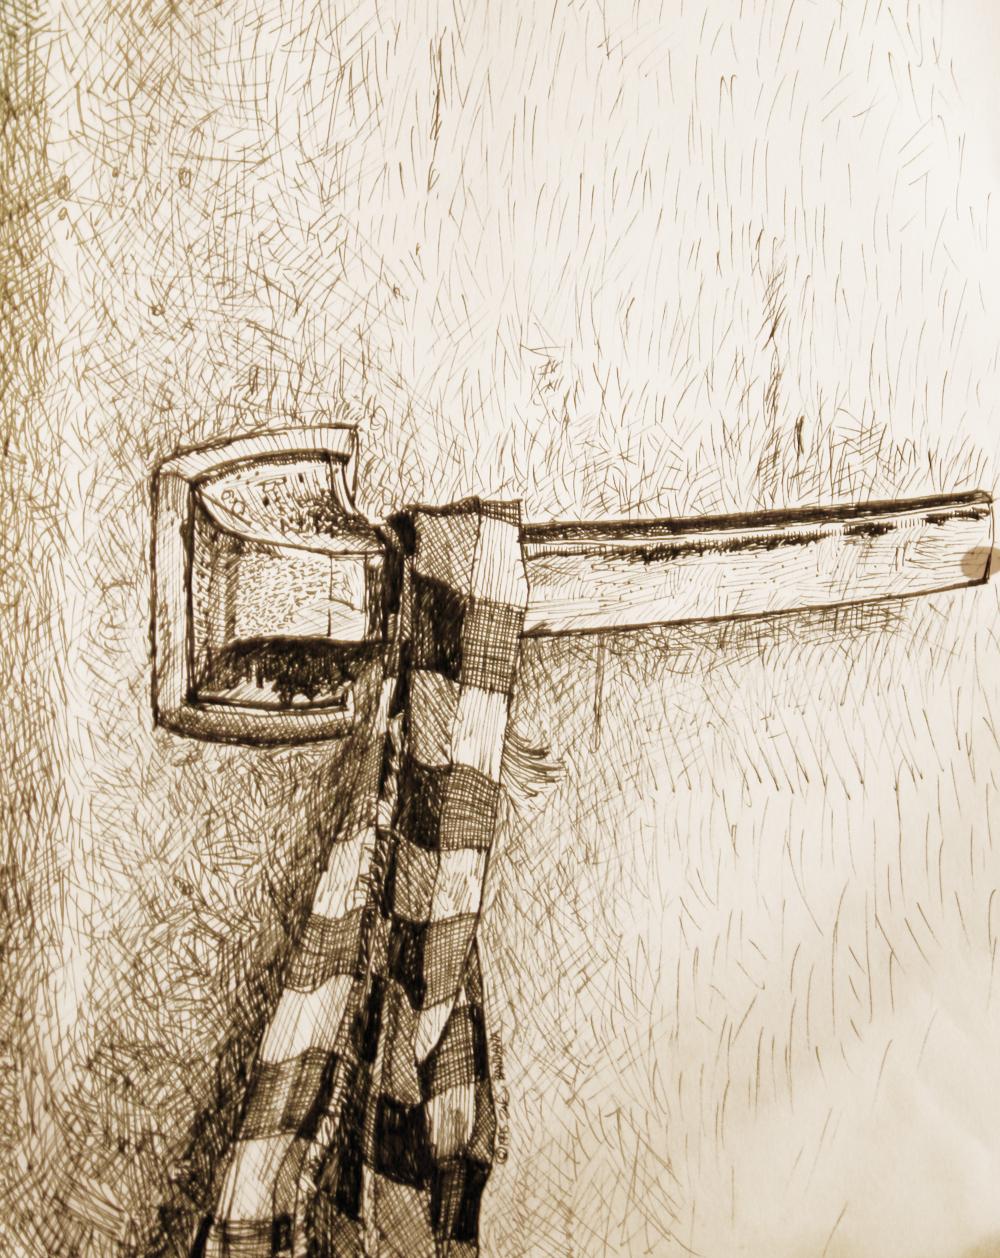 Fridge Door and Hot Pot Cloth - original drawing using permanent marker and ink by Cork Ireland Freelance Artist - Art van Leeuwen